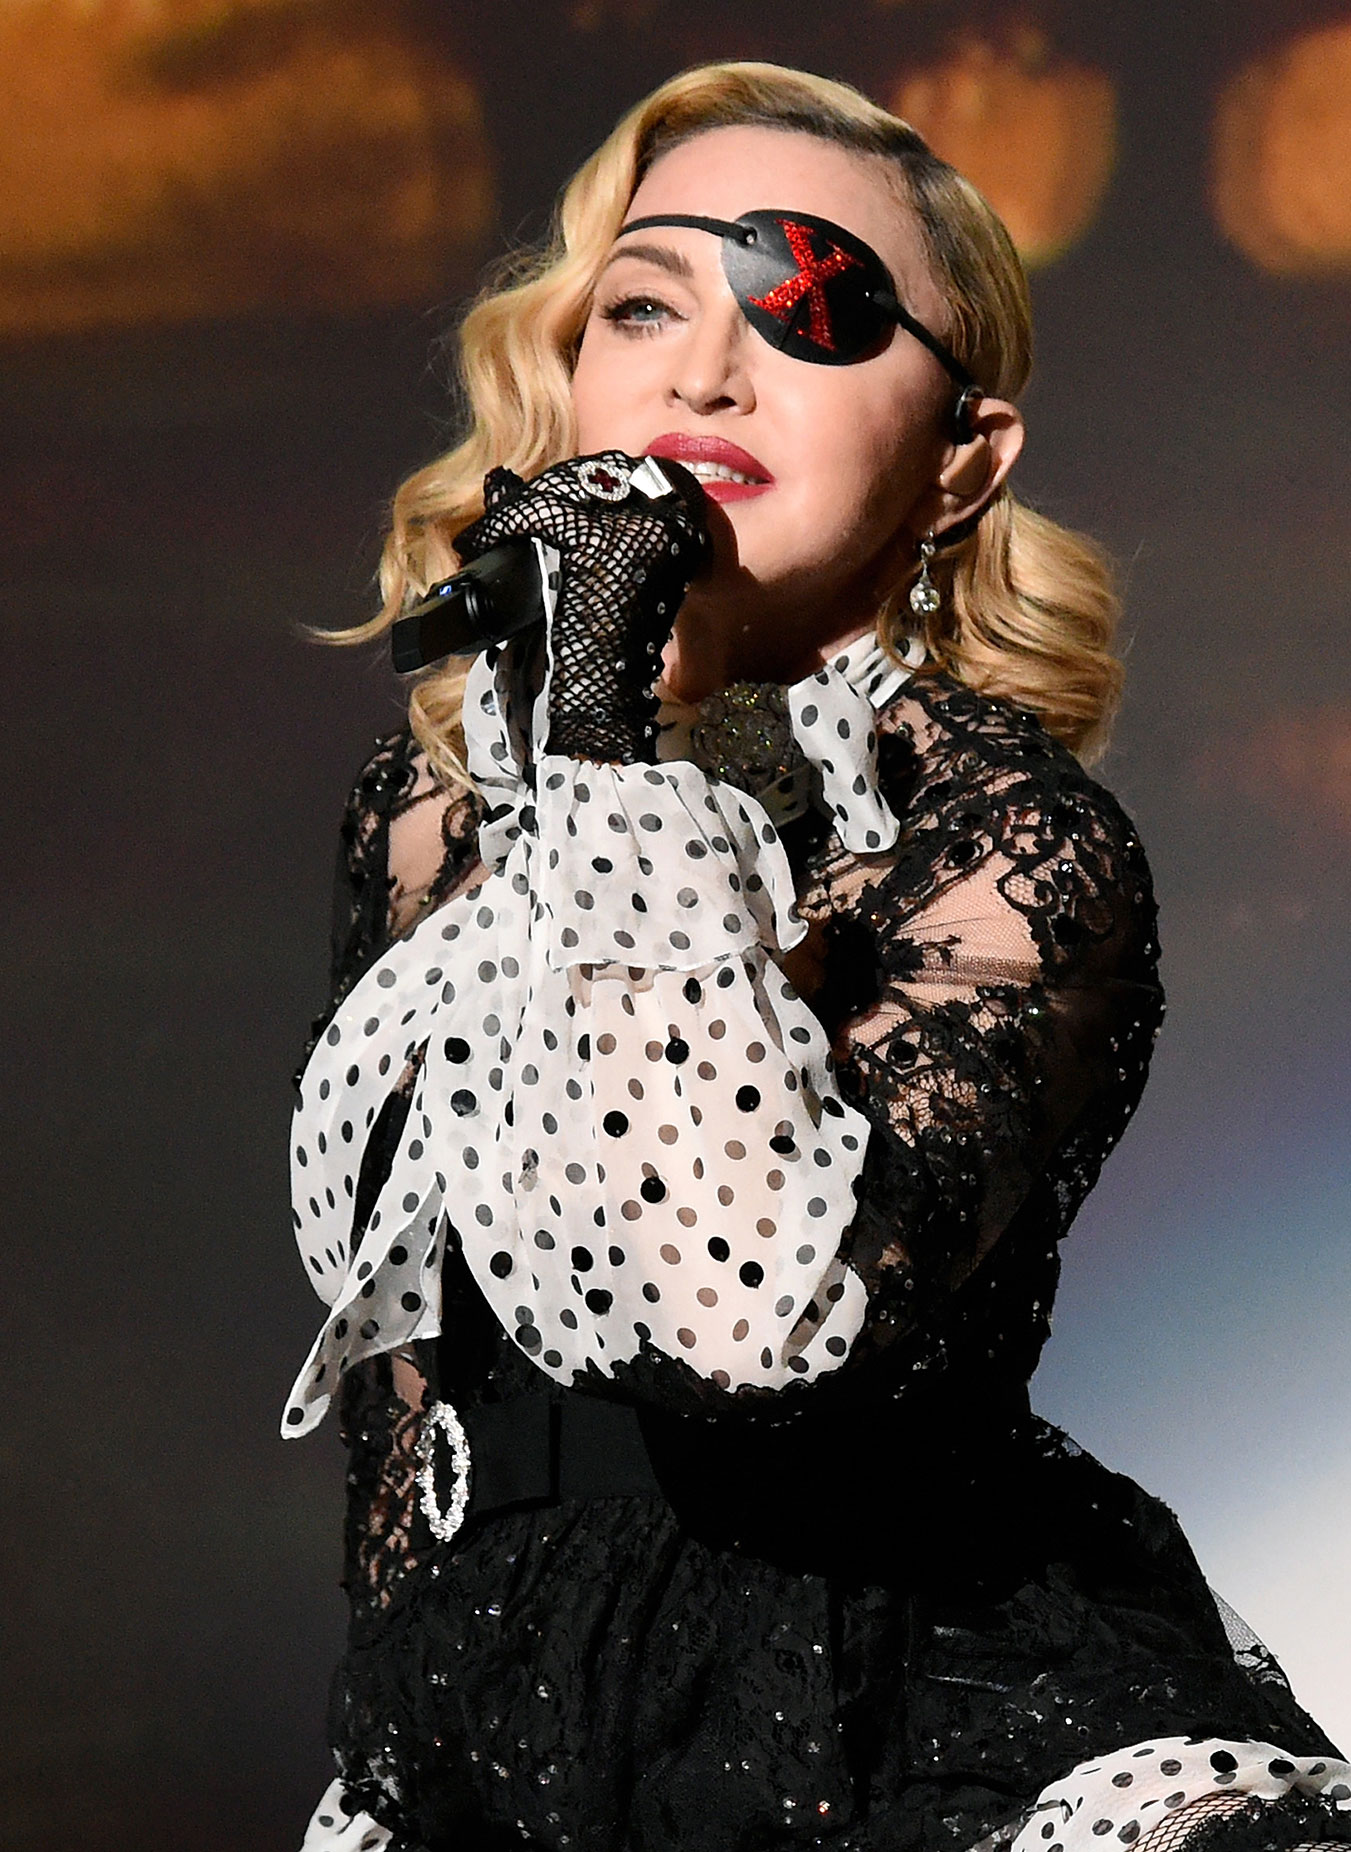 Madonna Sings At The 2019 Billboard Music Awards Eye Patch Madame X - Madonna performs at the Billboard Music Awards at MGM Grand Garden Arena in Las Vegas on May 1, 2019.